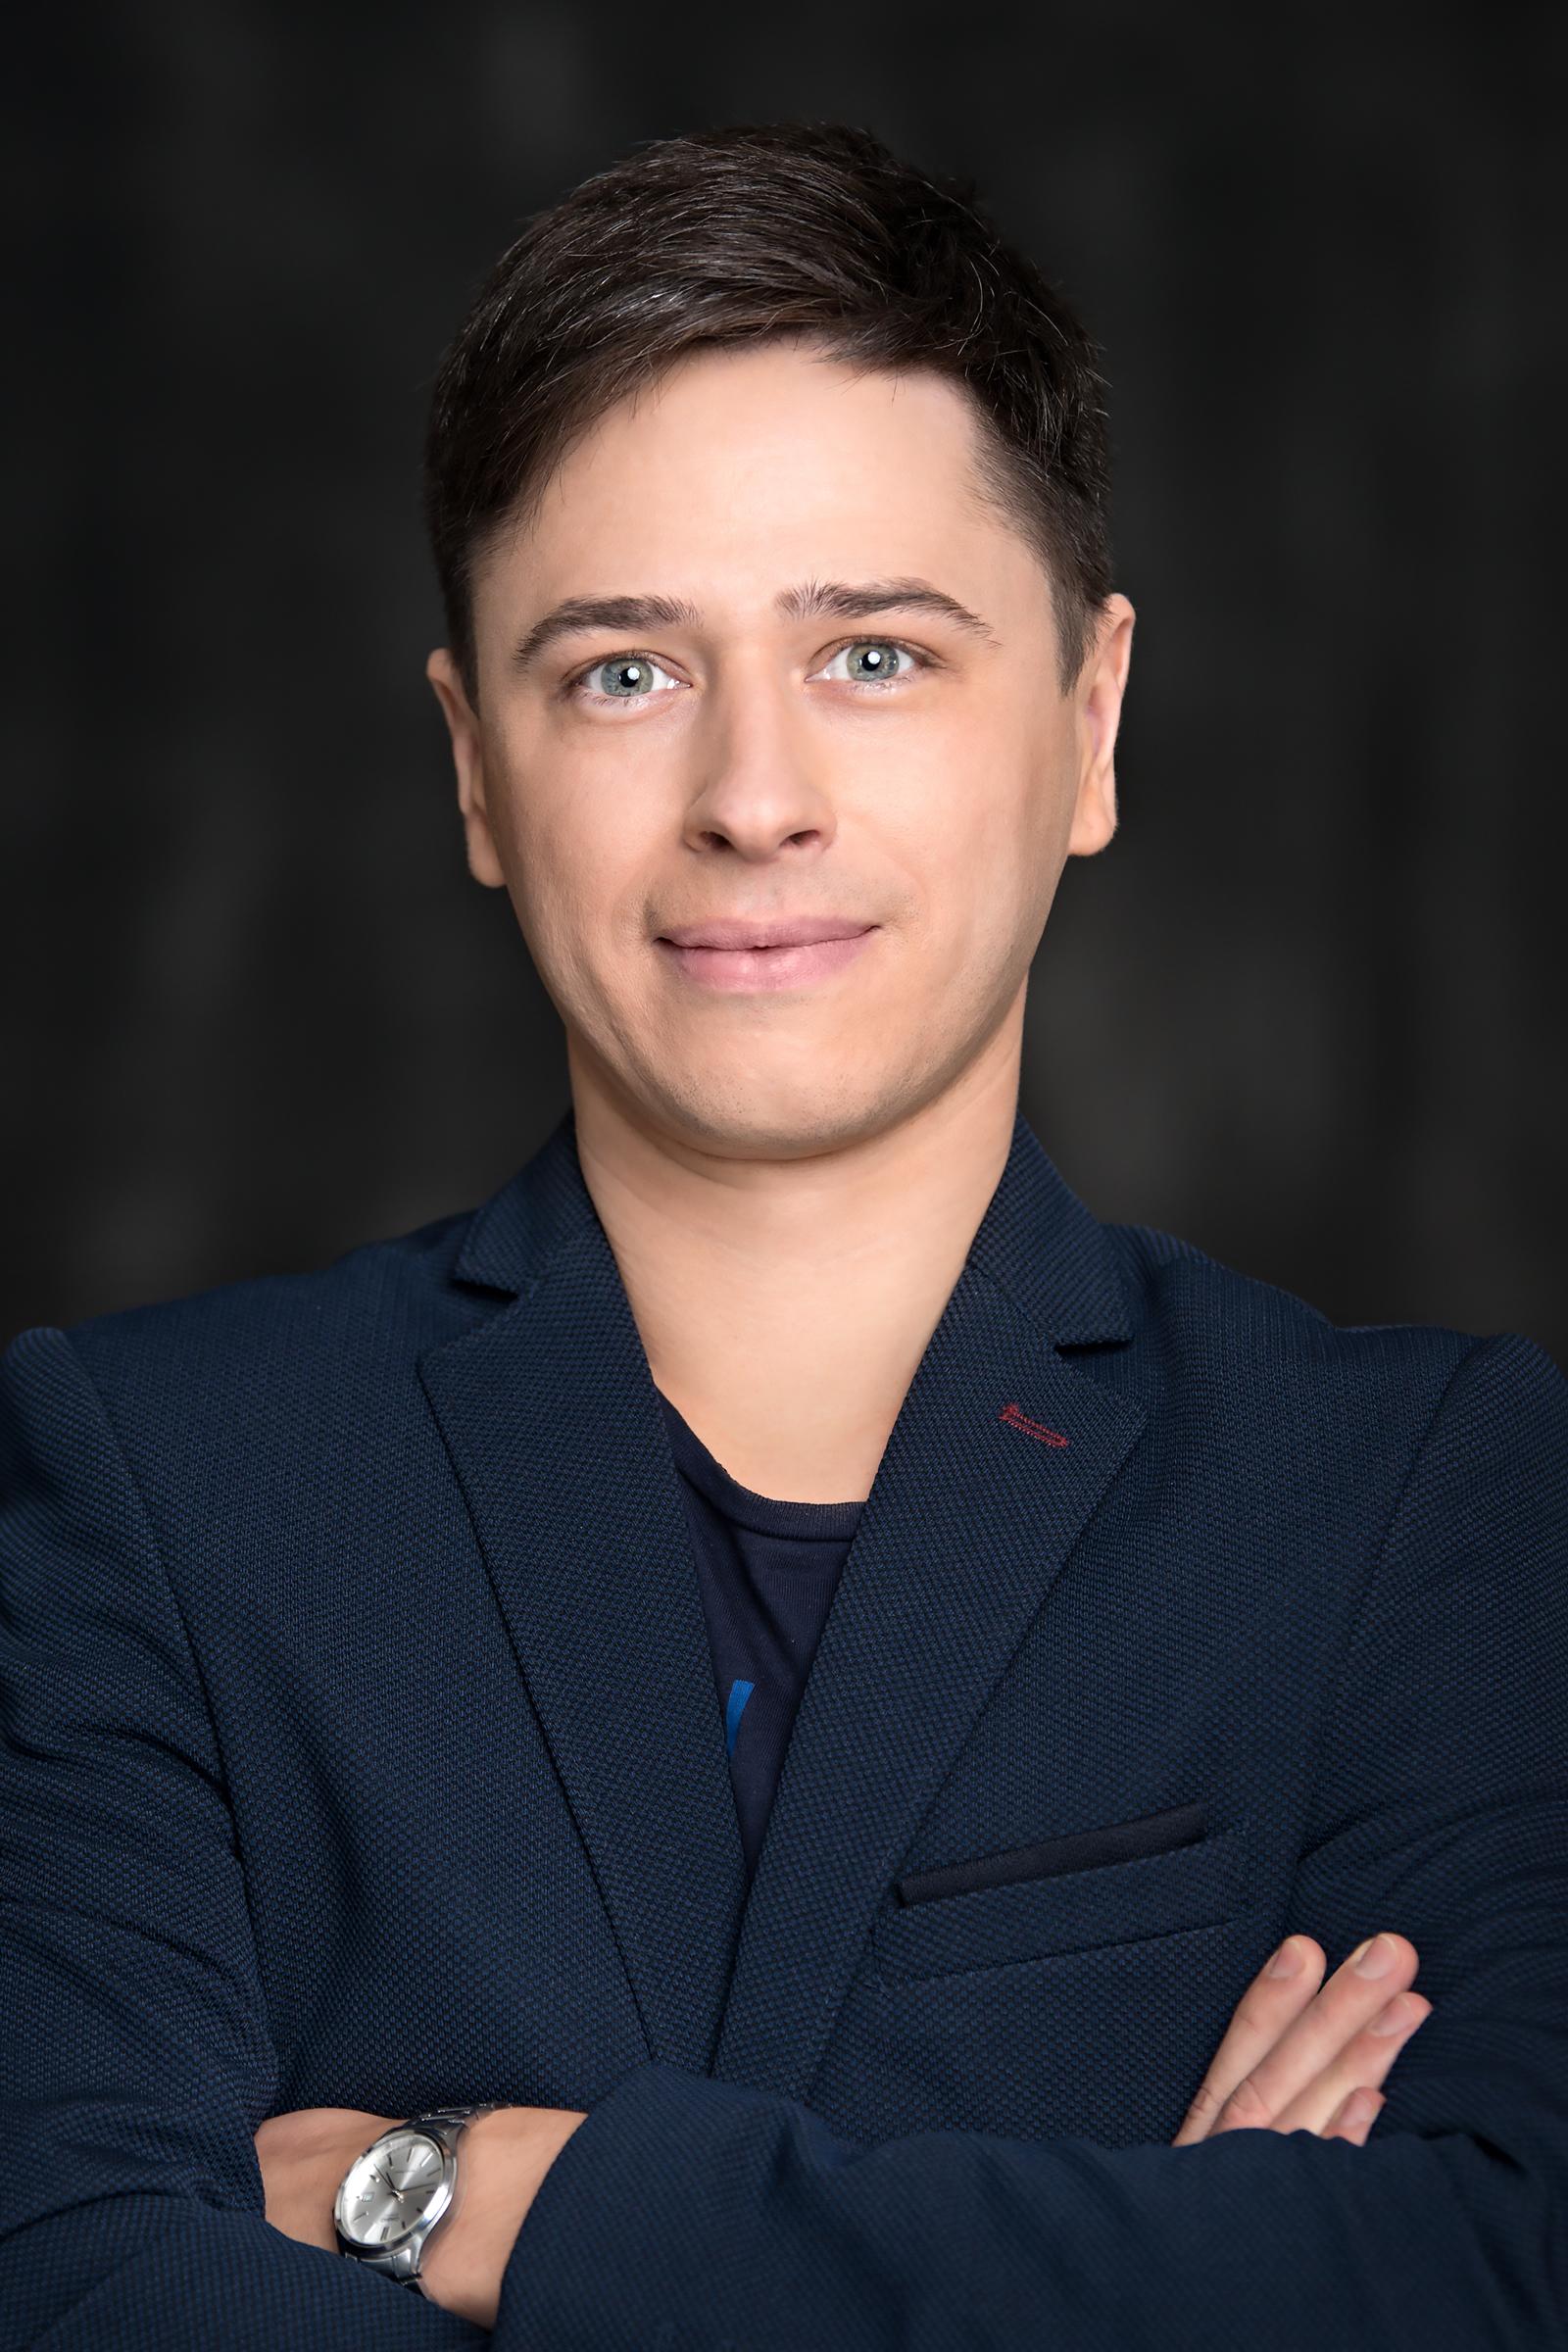 Martynas Kizys